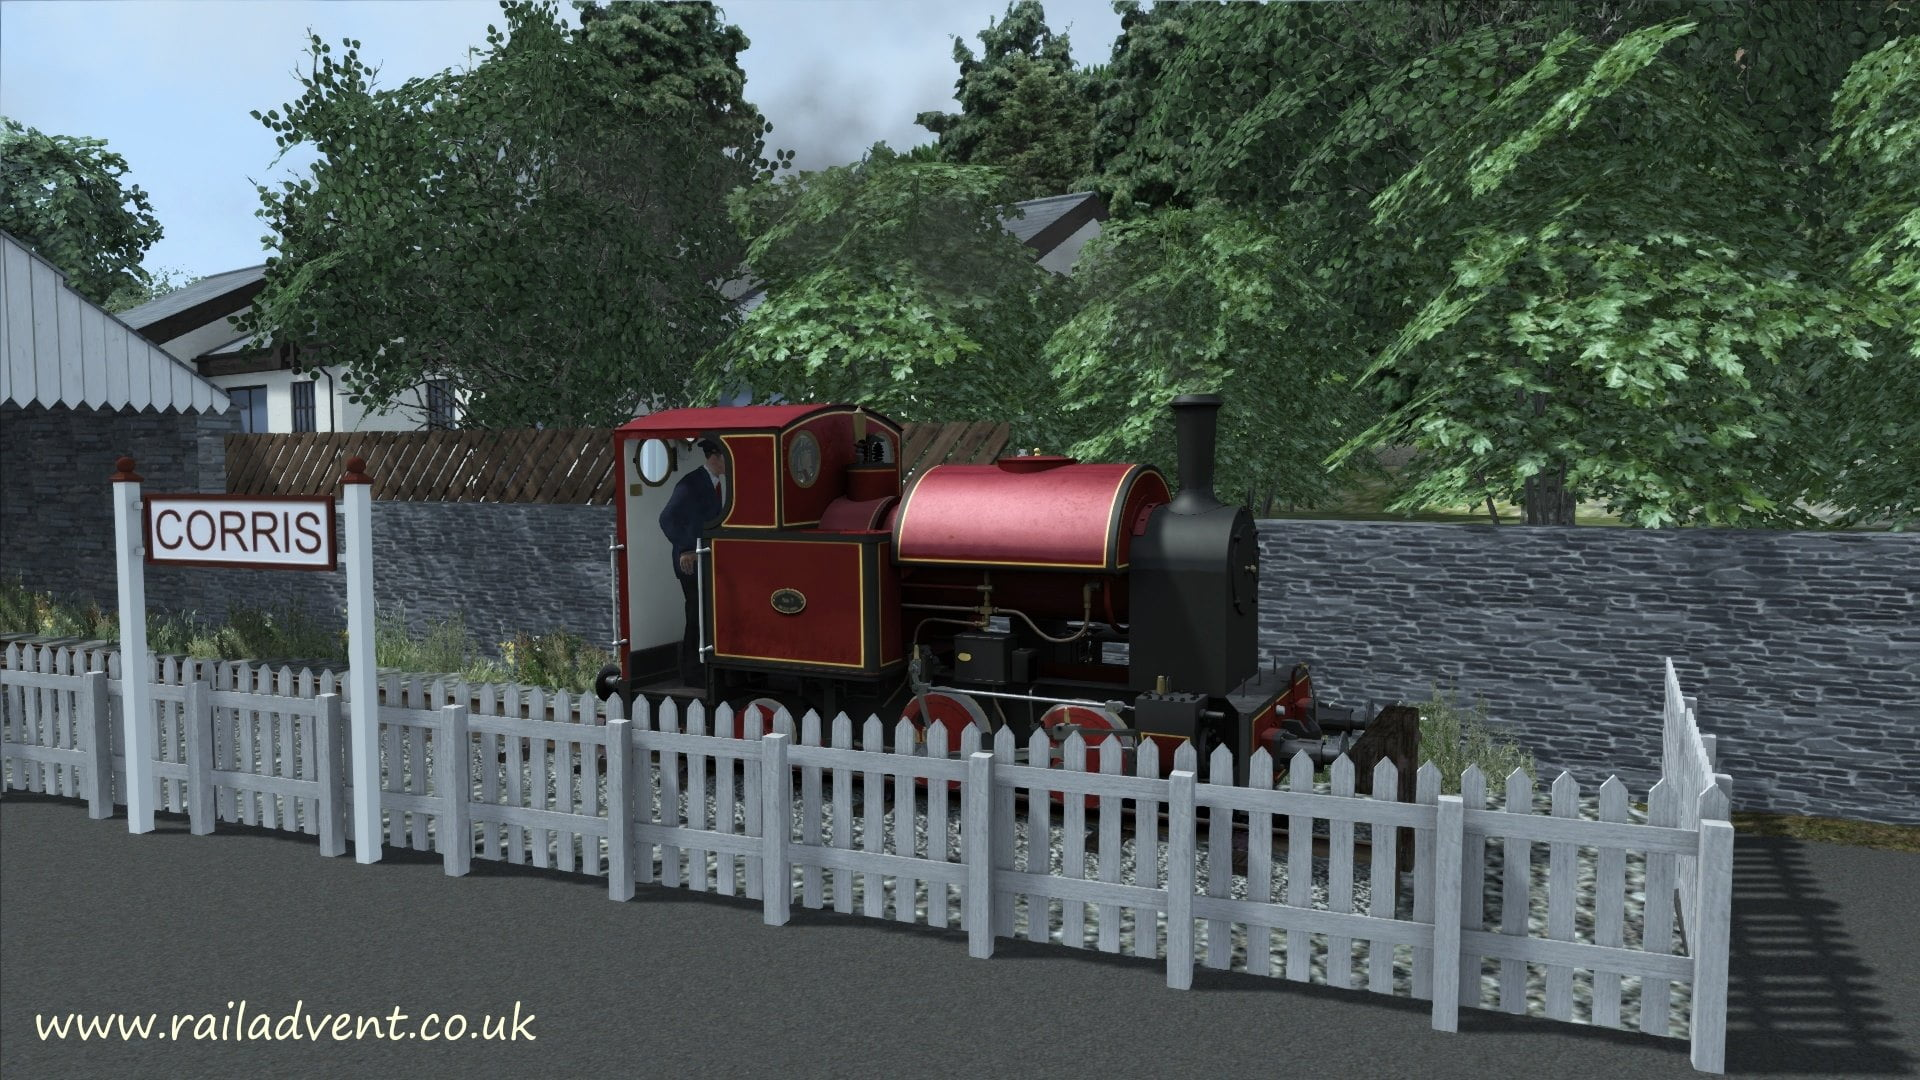 Corris Railway Station - Train Simulator 2016